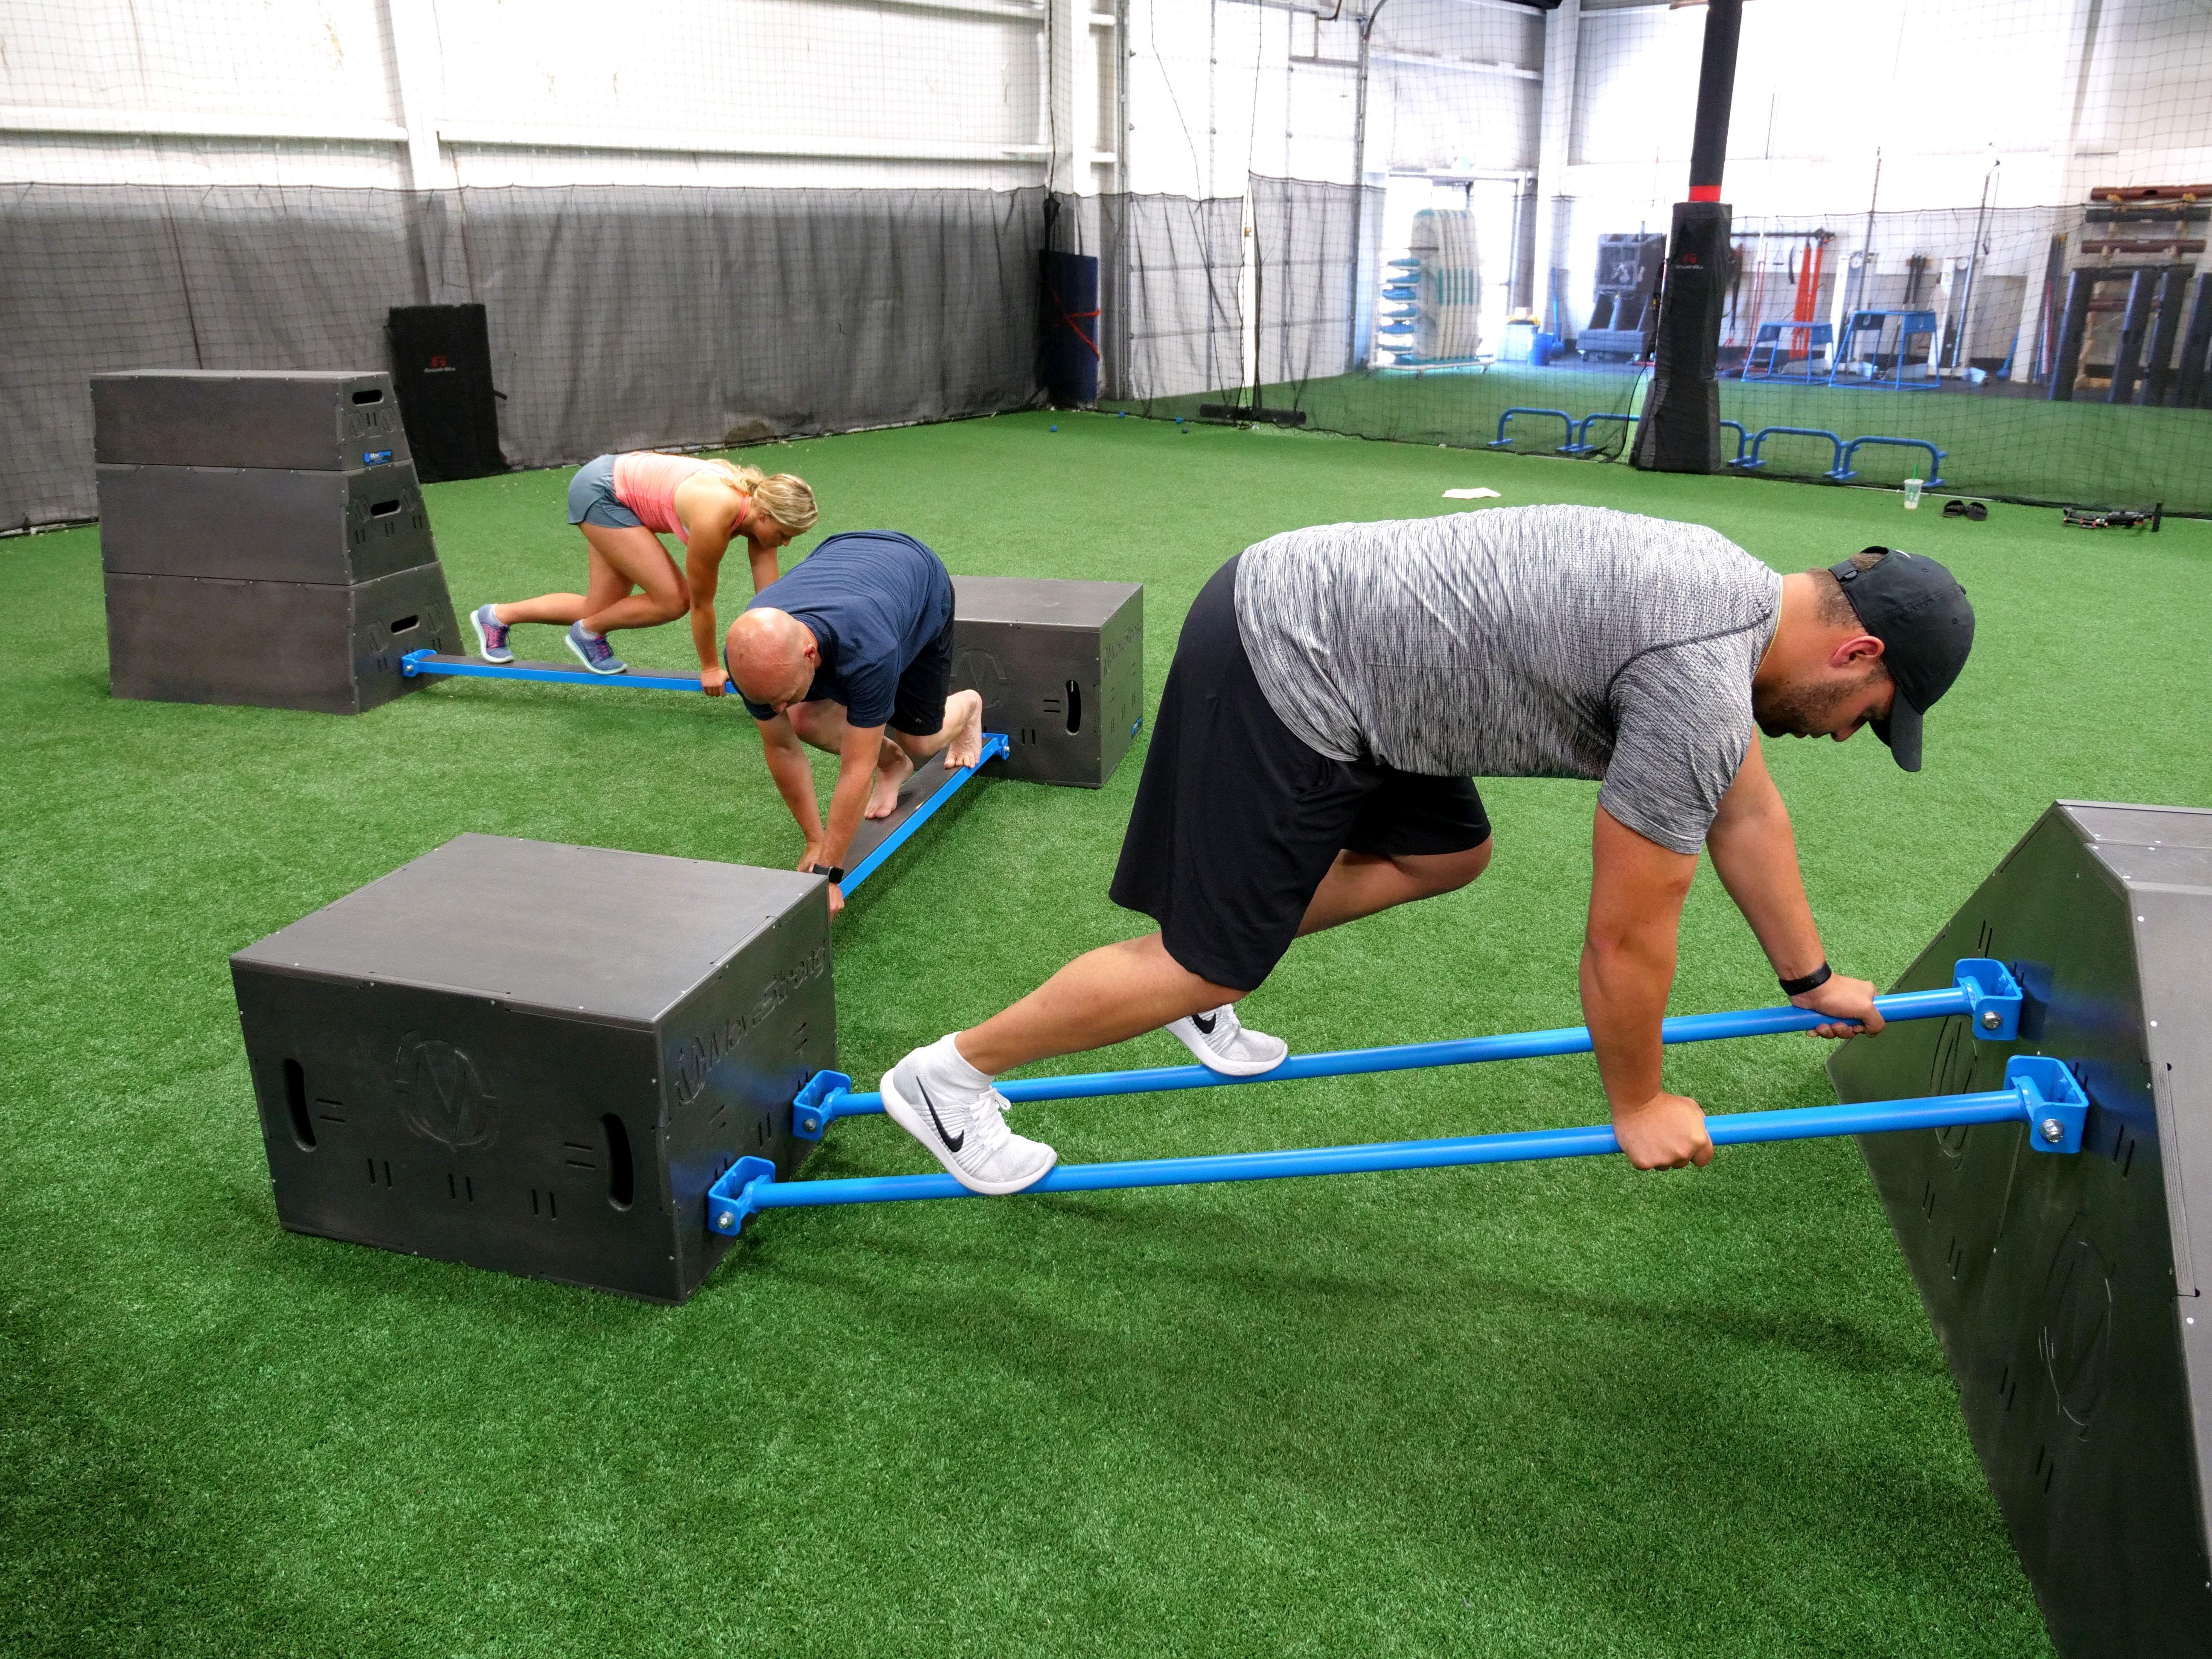 Functional Fitness Wall Bridge For Bodyweight Suspension Medicine Ball Training The Movestrong Nova Wal Sala De Gimnasio Gimnasio En Casa Diseno De Gimnasio